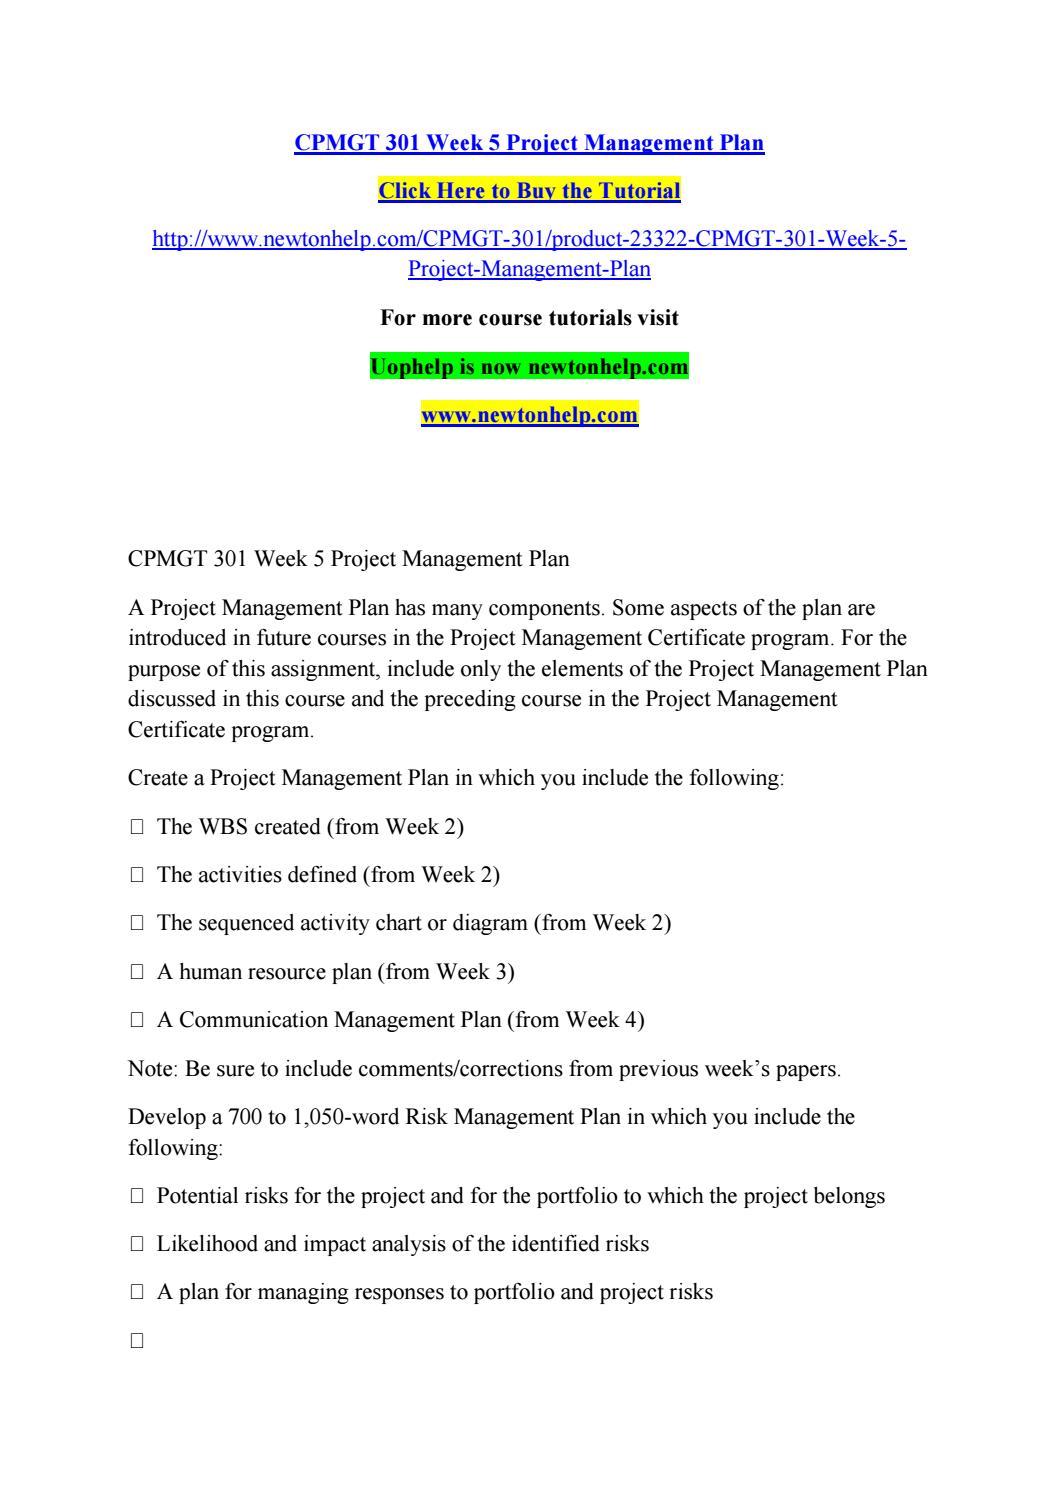 Cpmgt 301 Week 5 Project Management Plan By Beautifulflowersg